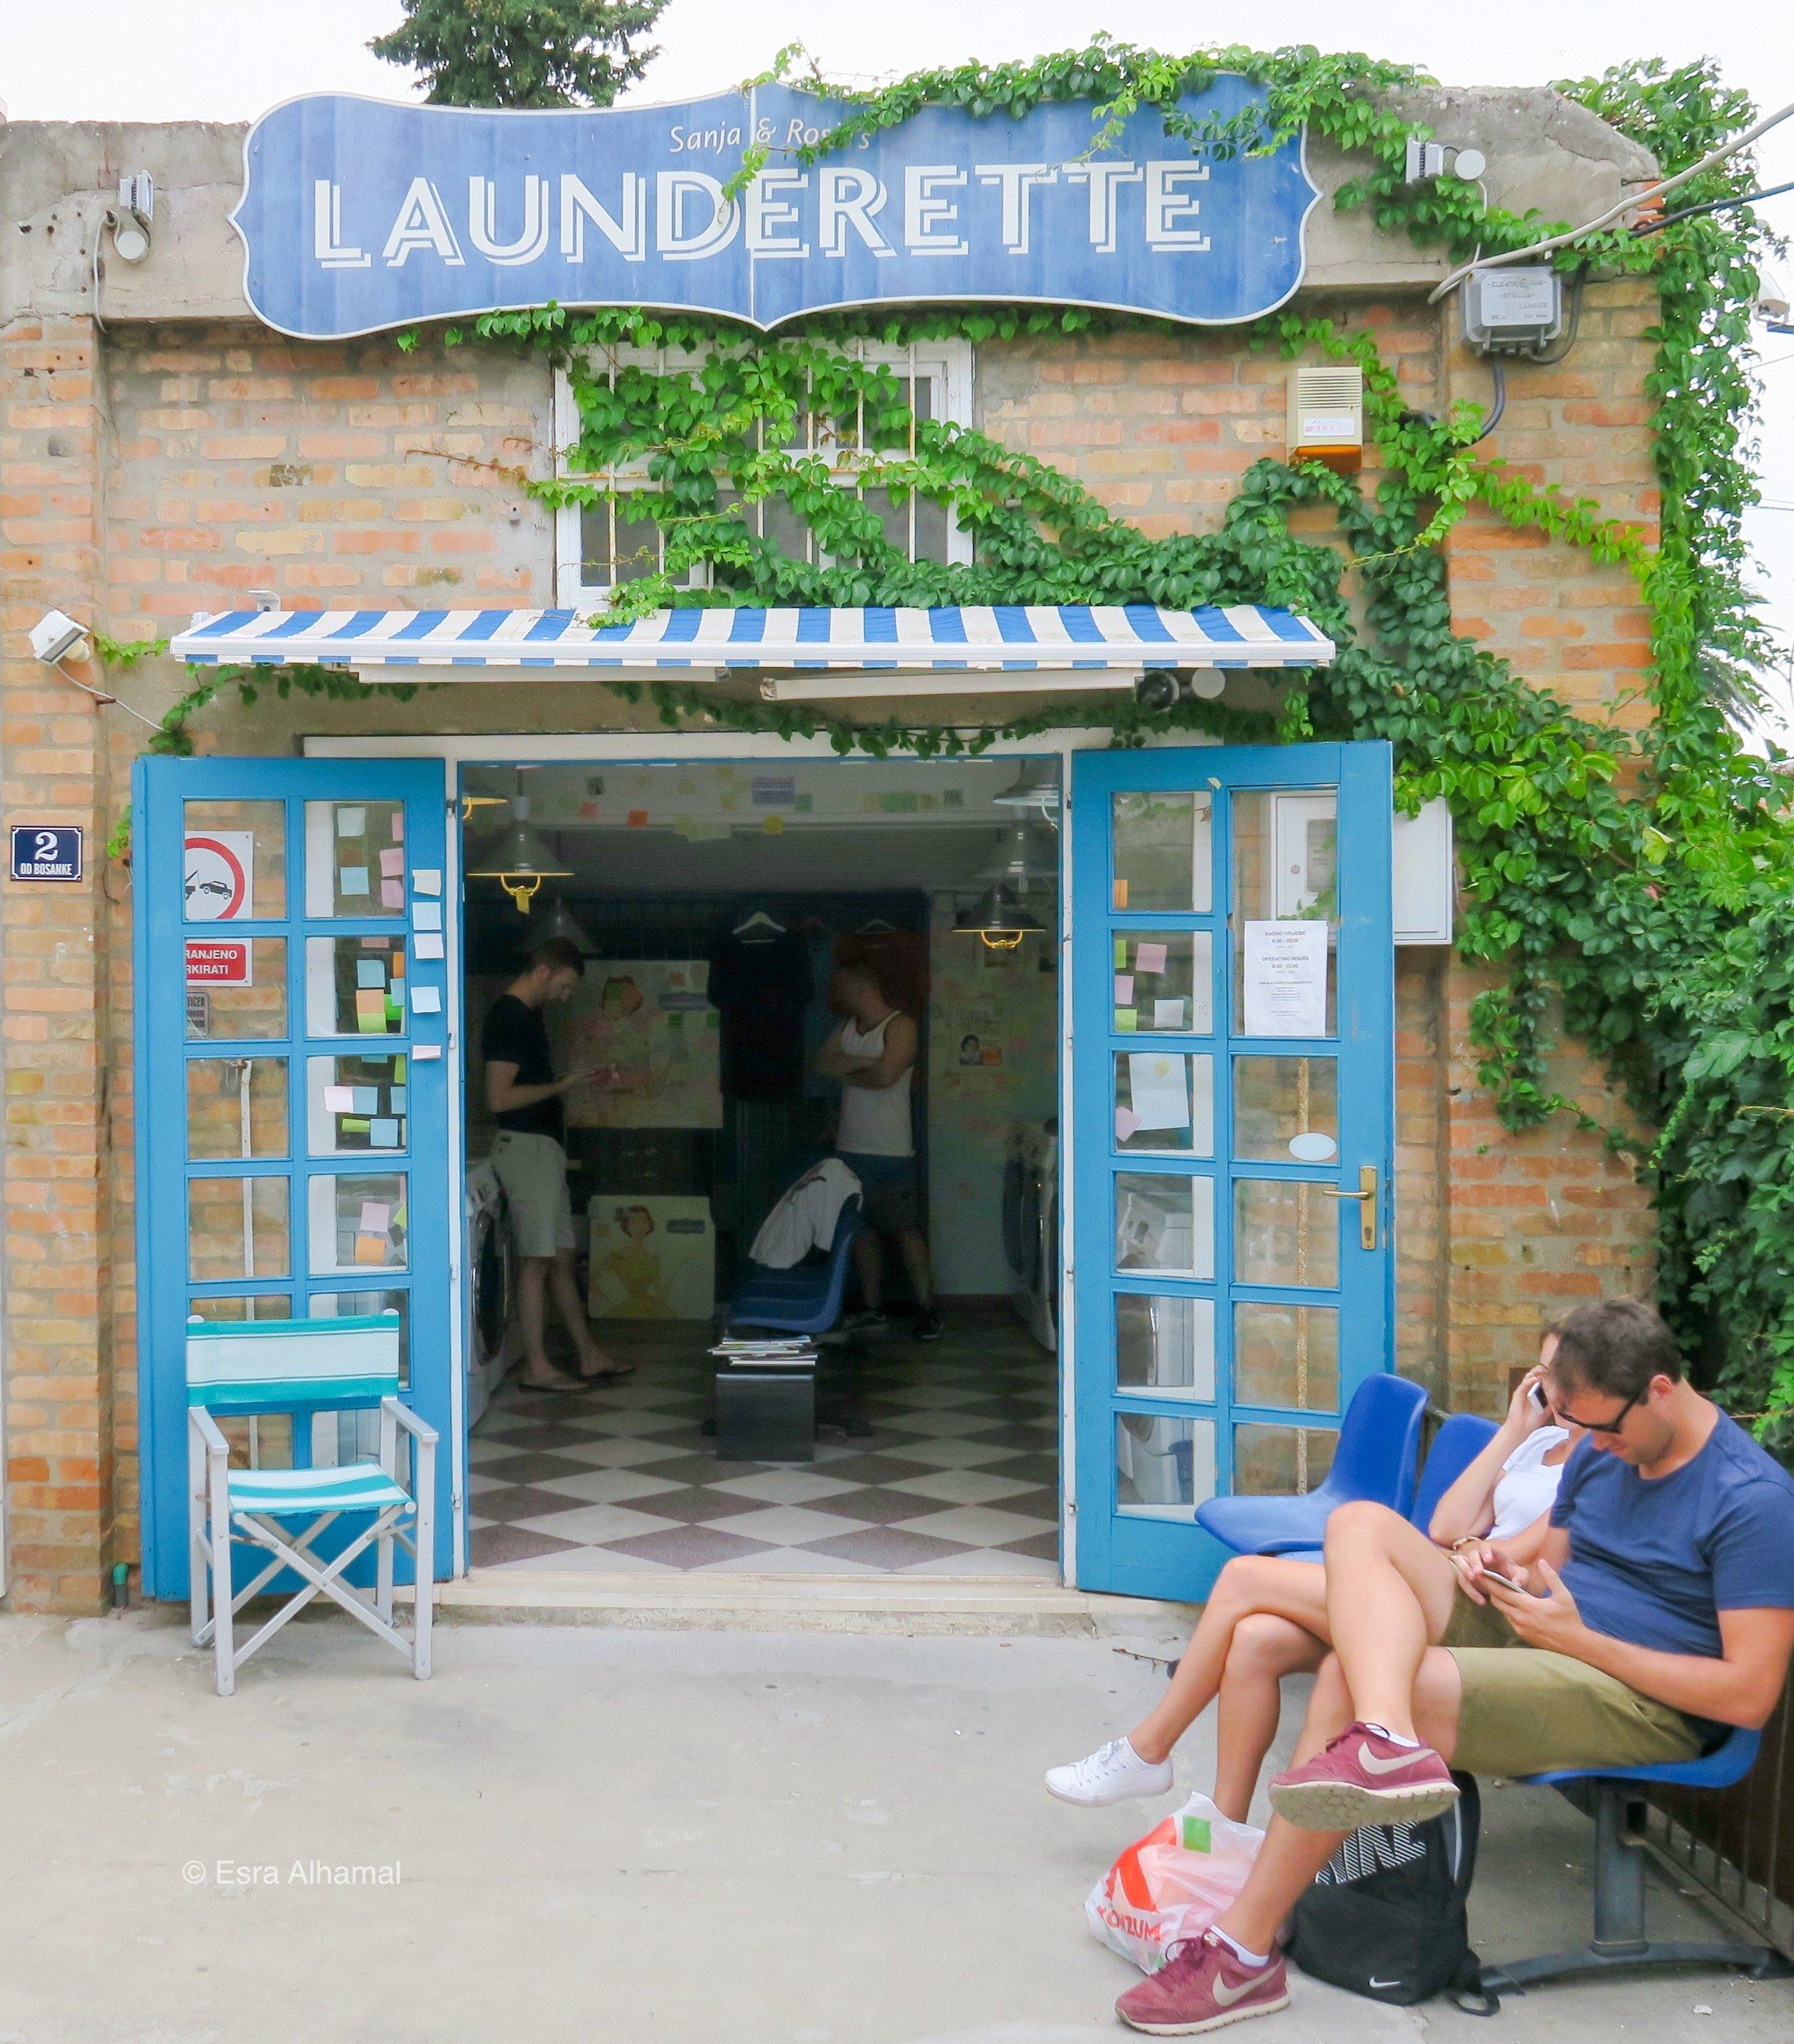 Launderette in Dubrovnik